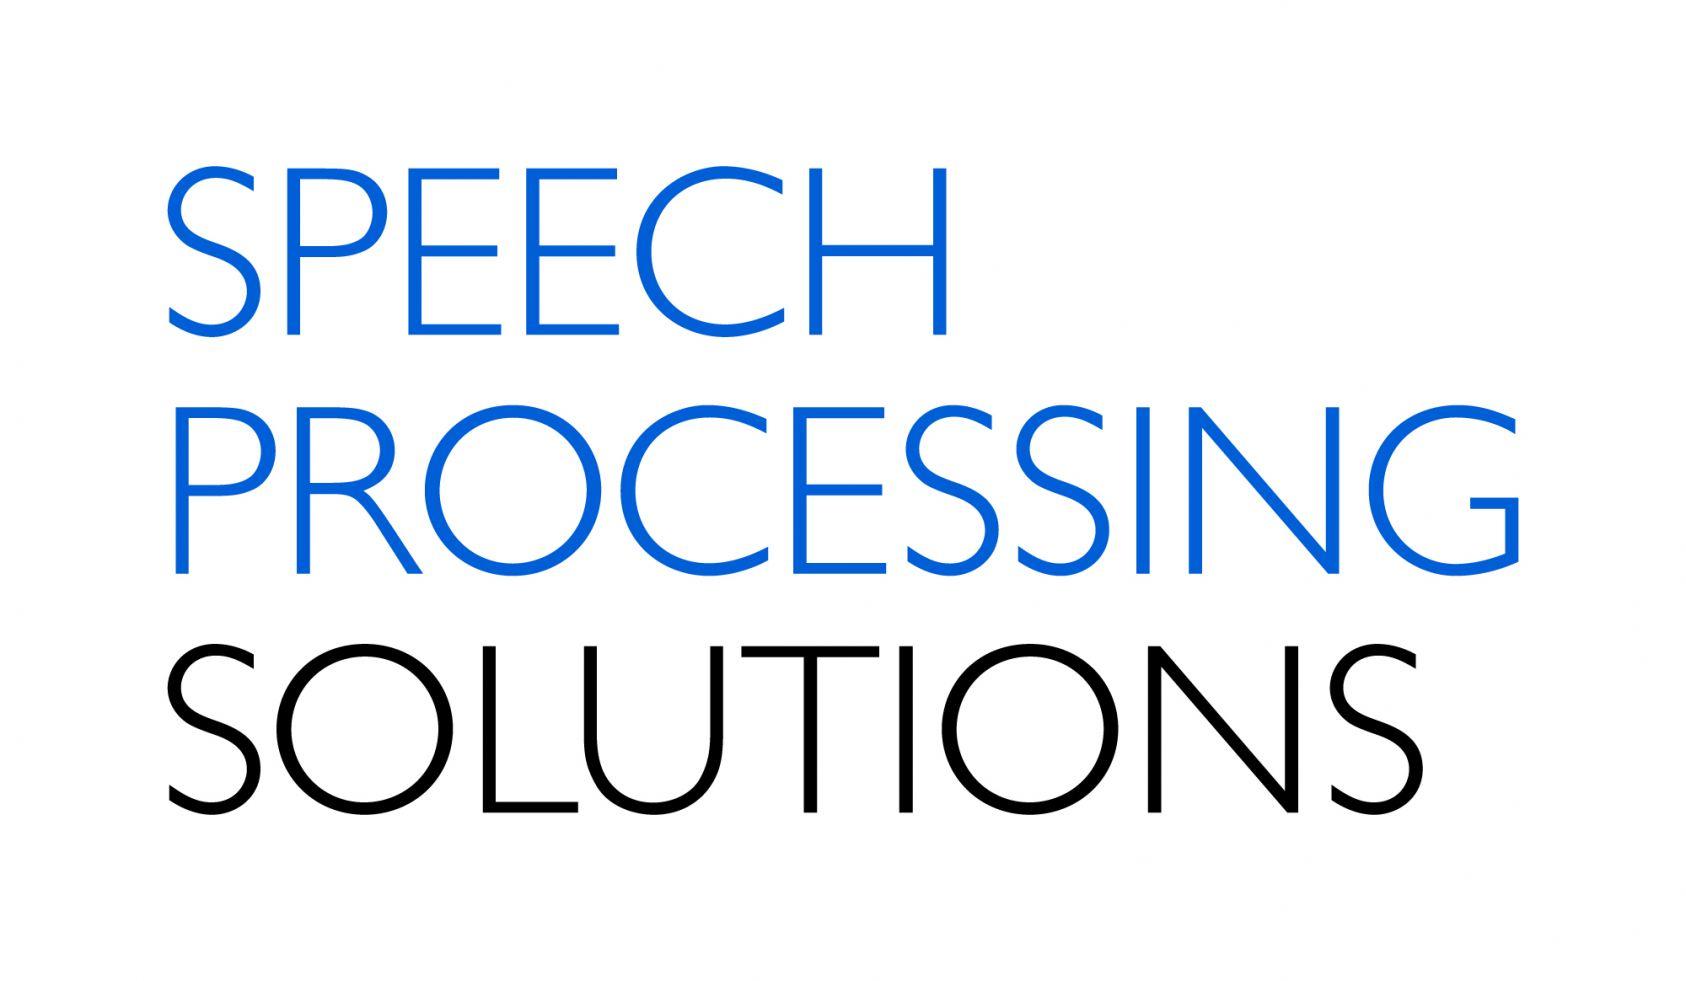 Speech Processing Solutions Logo